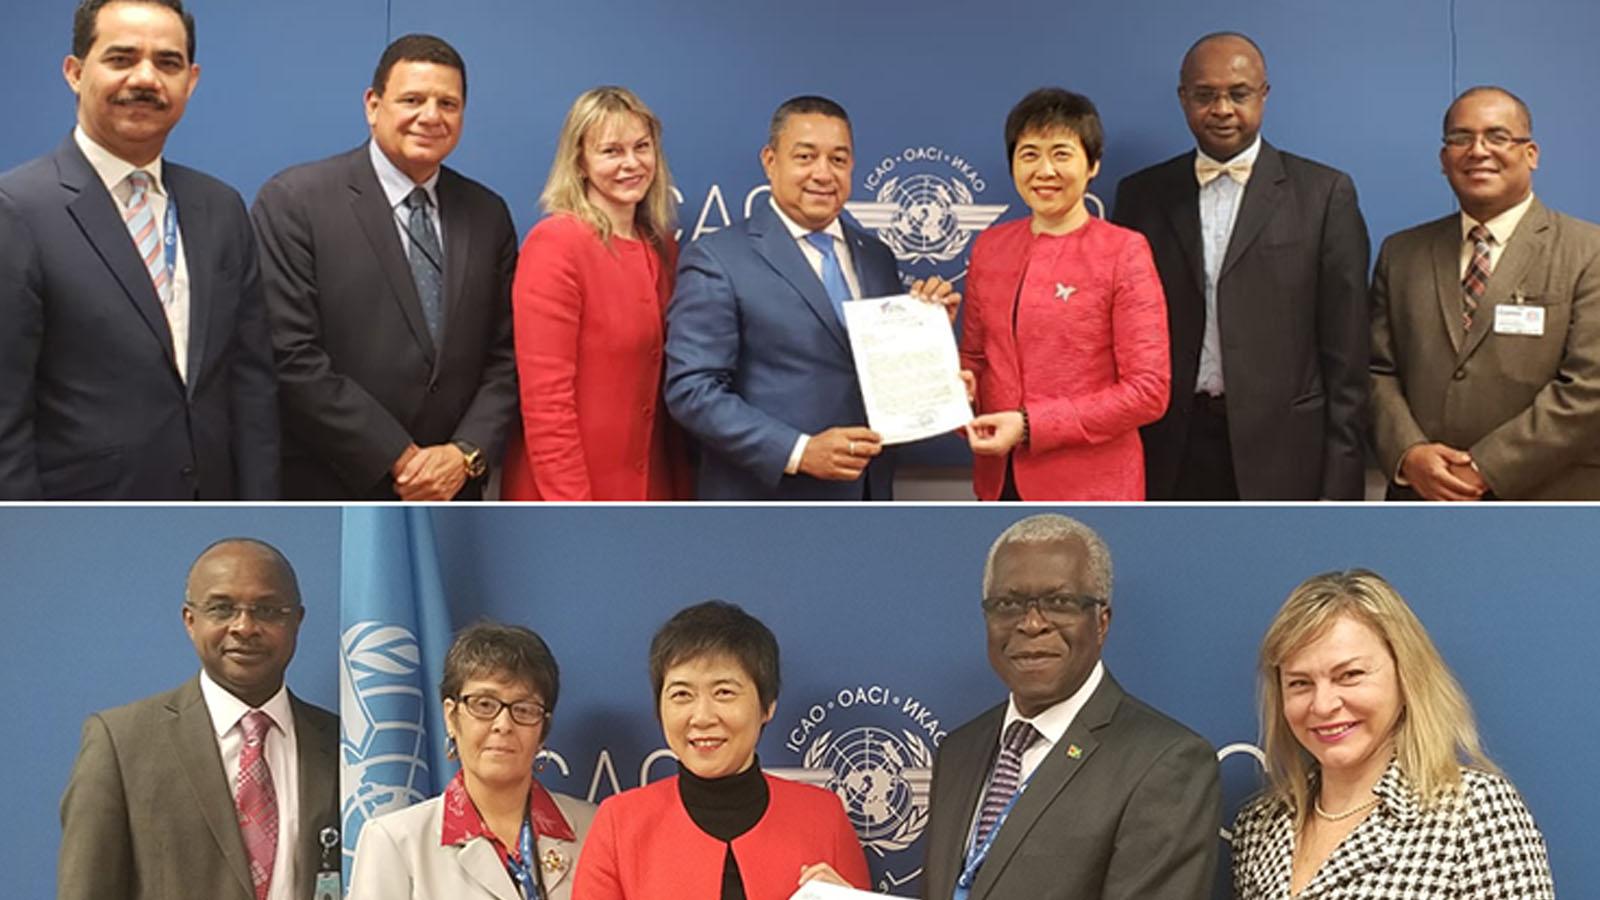 Dominican Republic and Guyana confirm CORSIA participation